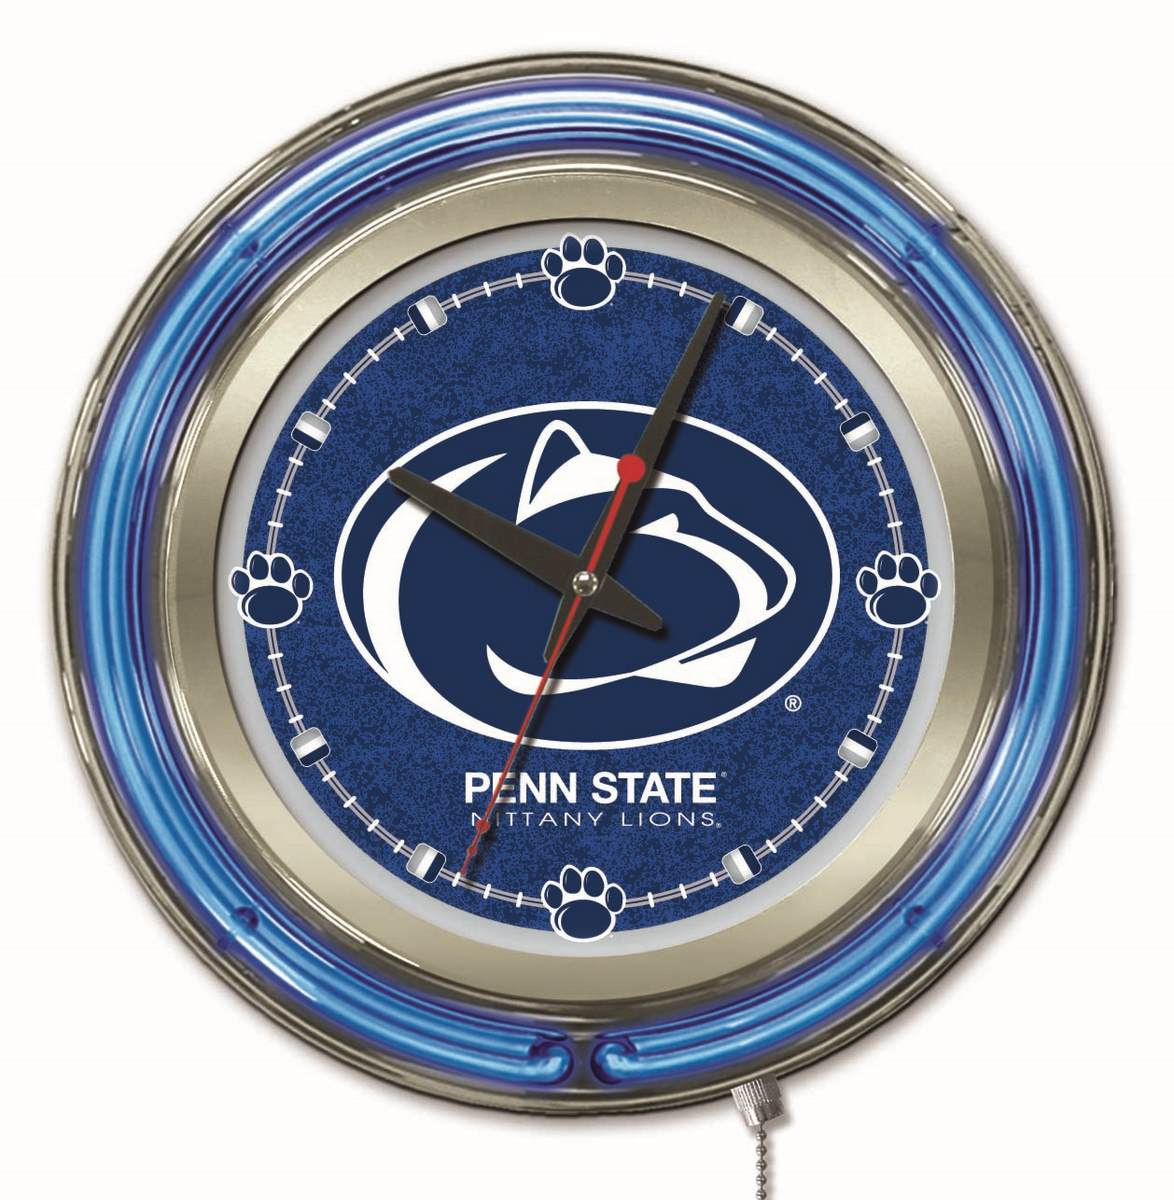 Penn State Double Neon Ring 15quot dia Logo Clock Zerbee : Clk15PennSt from zerbee.com size 1174 x 1200 jpeg 171kB